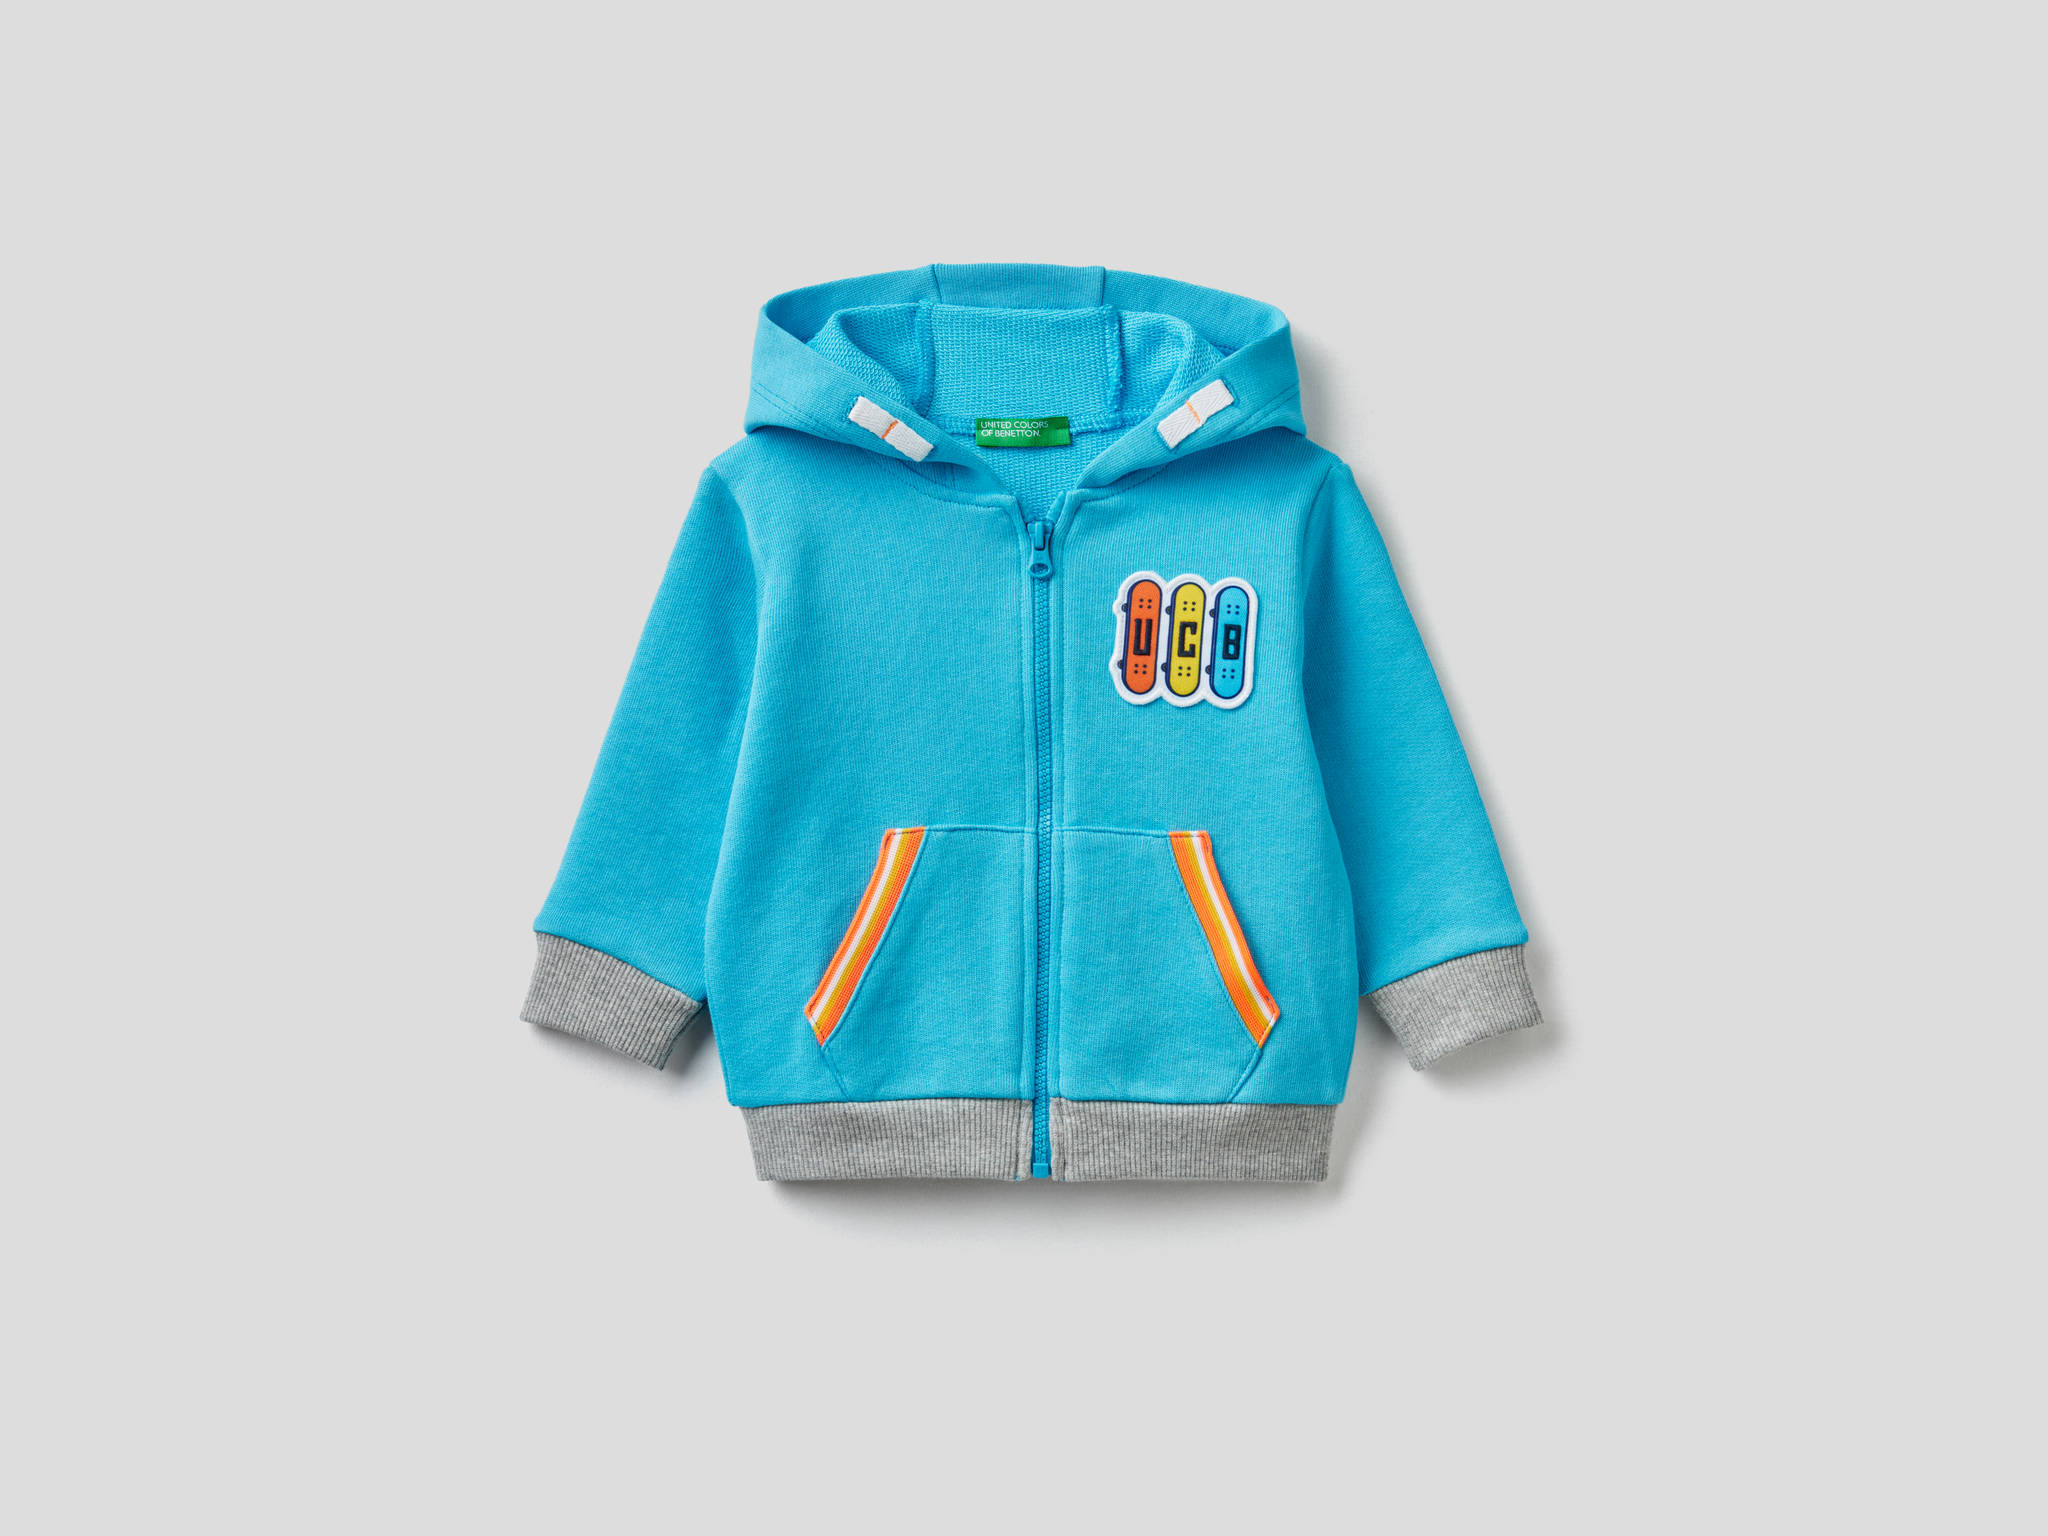 Kaykay Aplike Sweatshirt